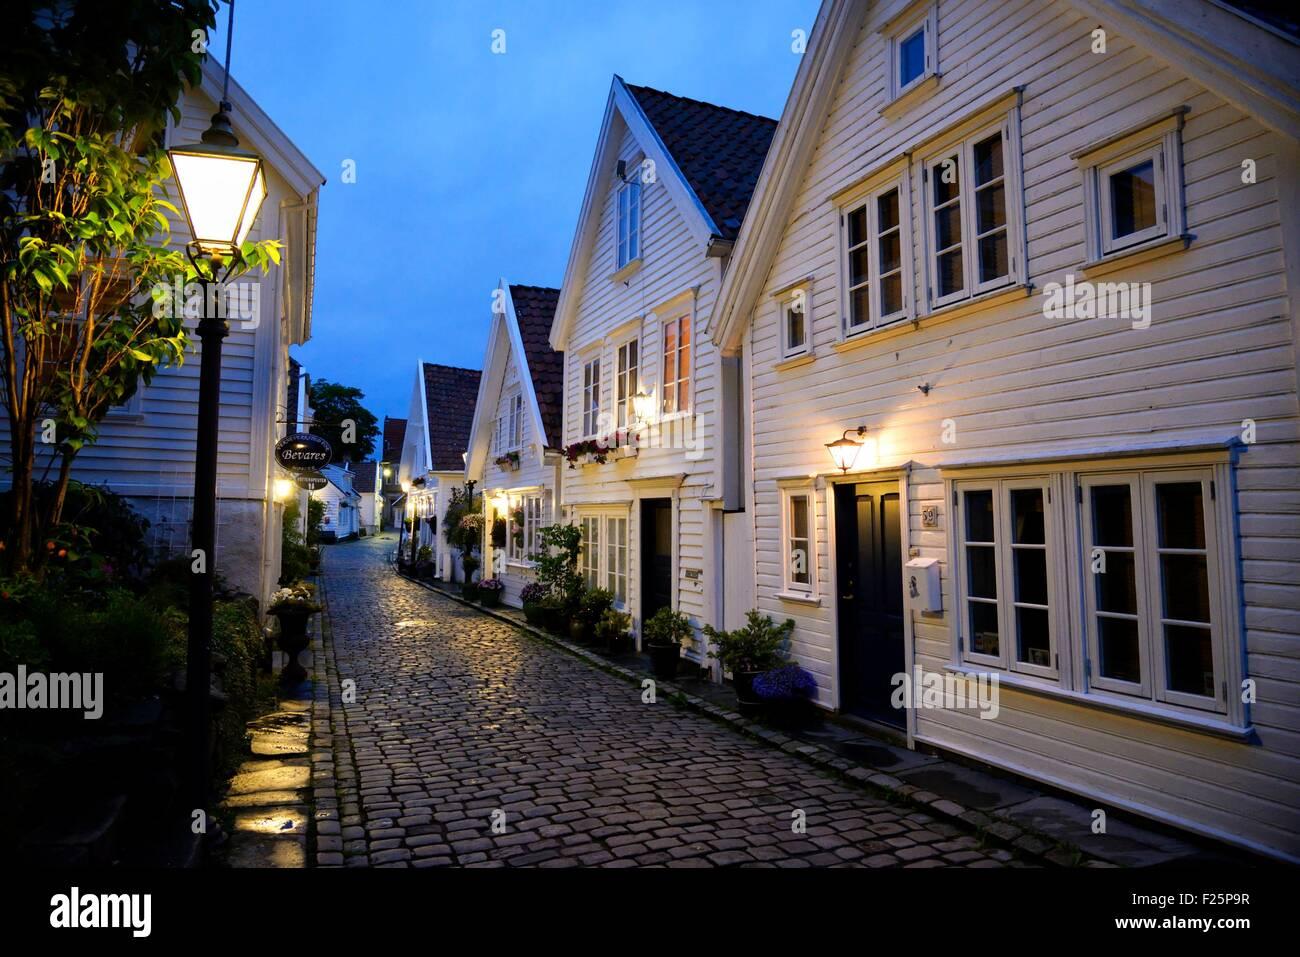 Norway, Rogaland, Stavanger, Gamle Stavanger (old town) Stock Photo